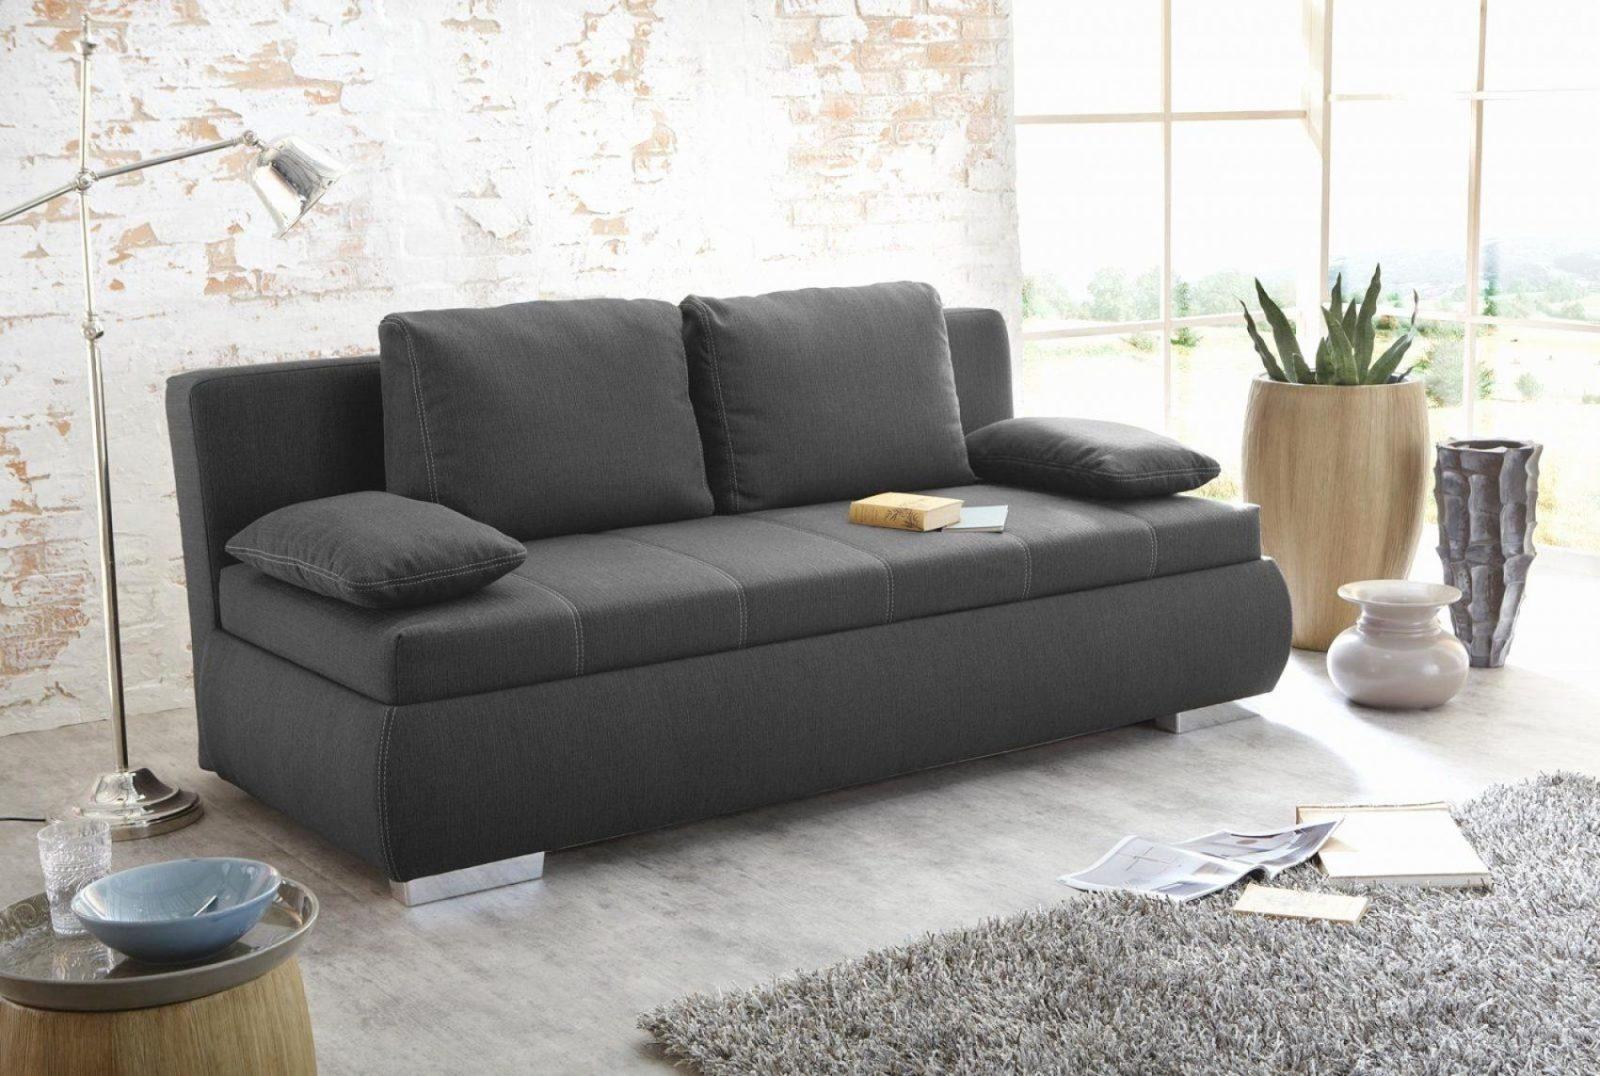 Fresh 3 Sitzer Sofa Poco Neu Sconto Couch Cool Sedac Souprava von 3 Sitzer Sofa Poco Bild